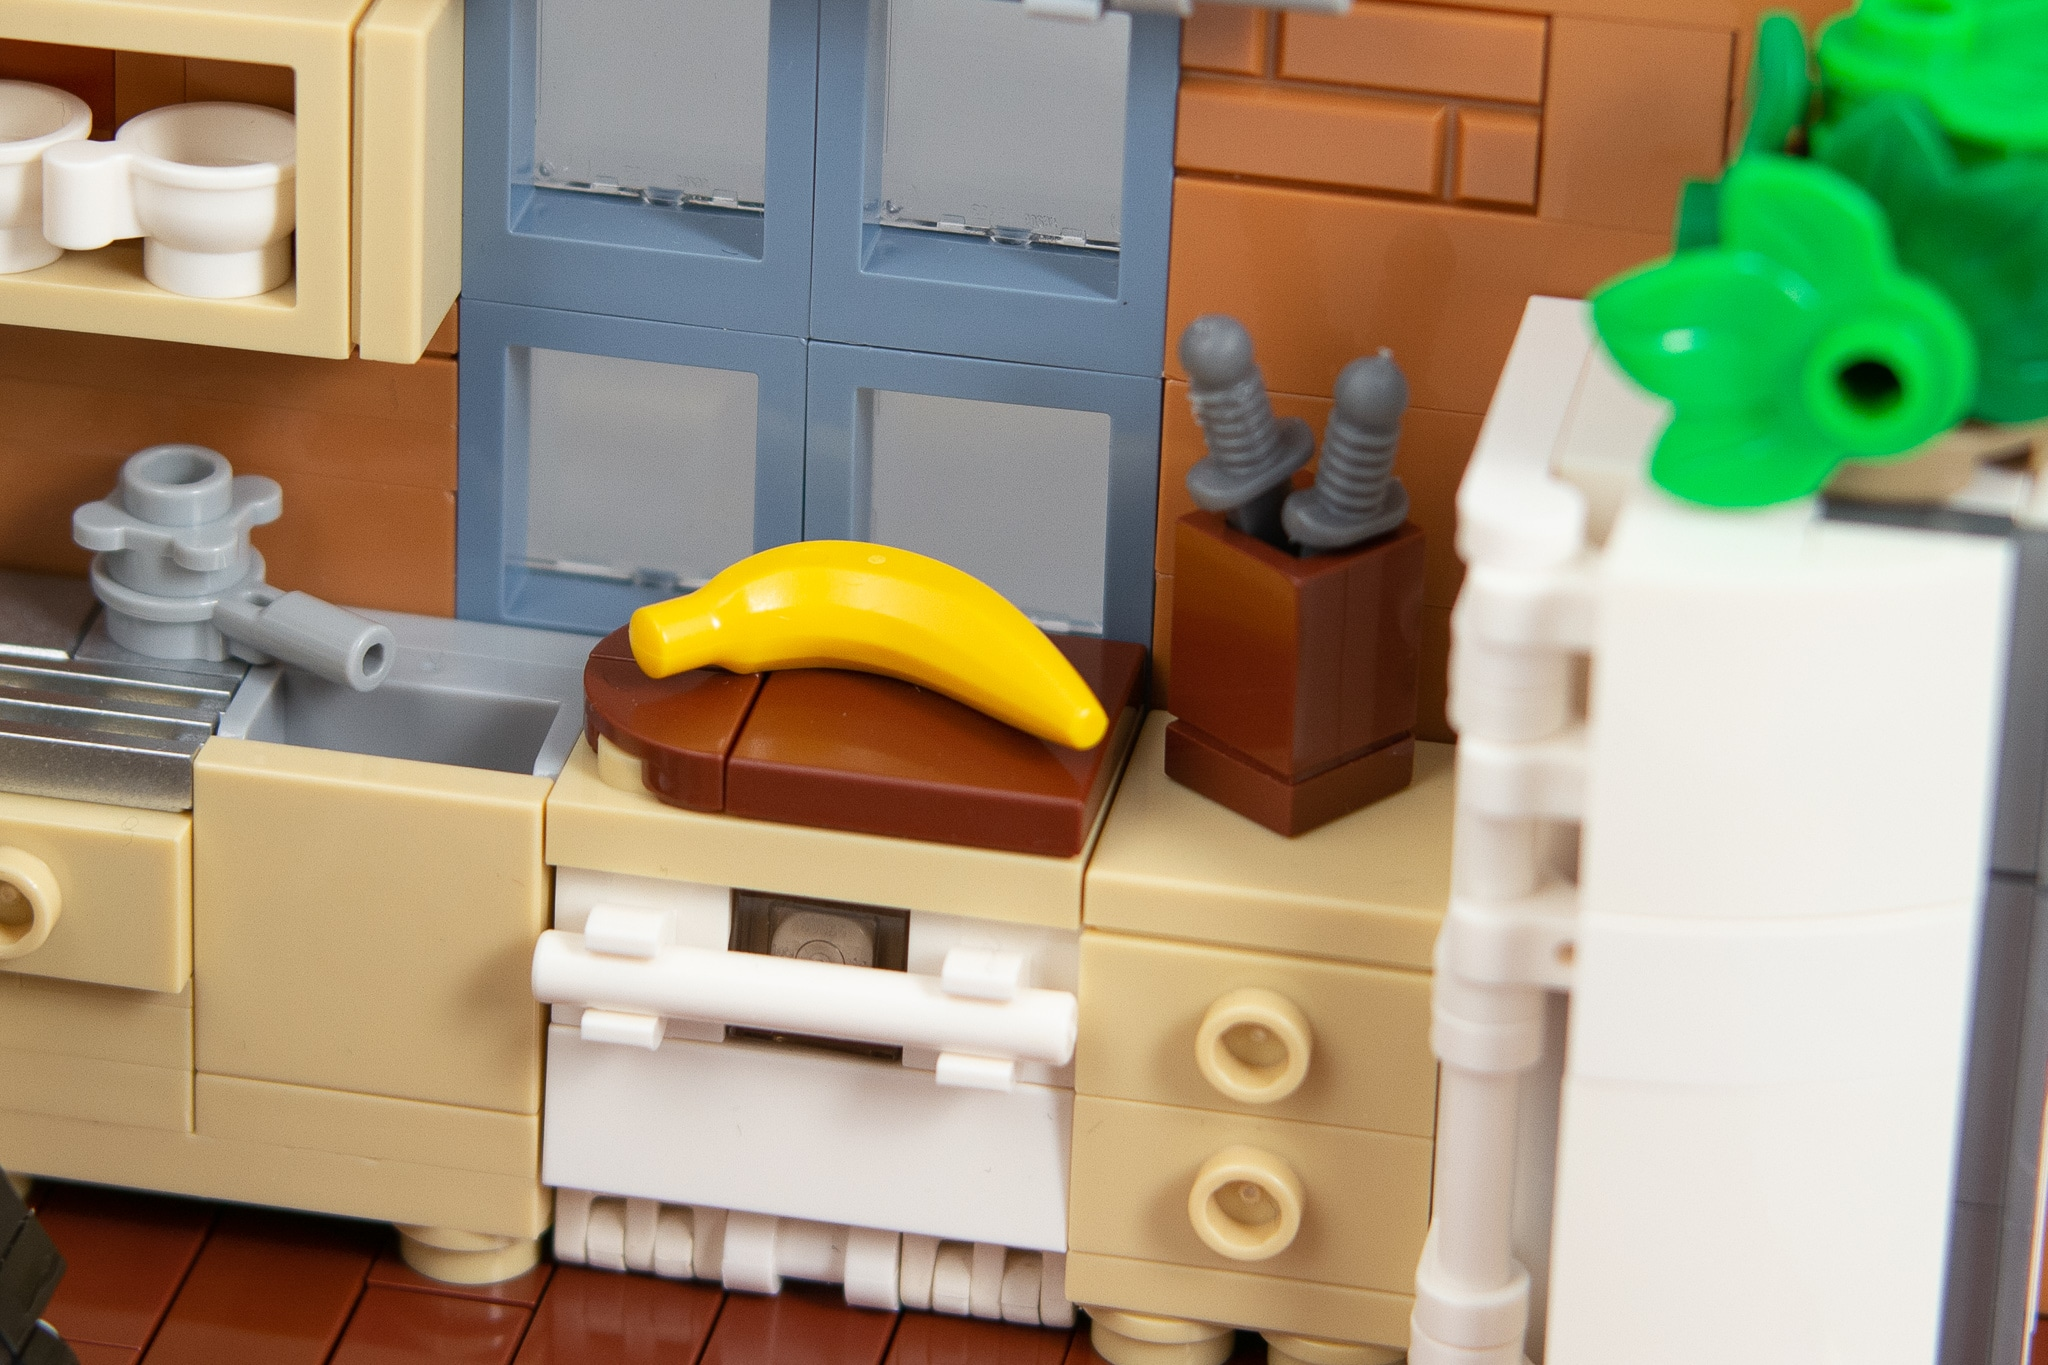 lego-kueche-spuelmaschine-schneidebrett